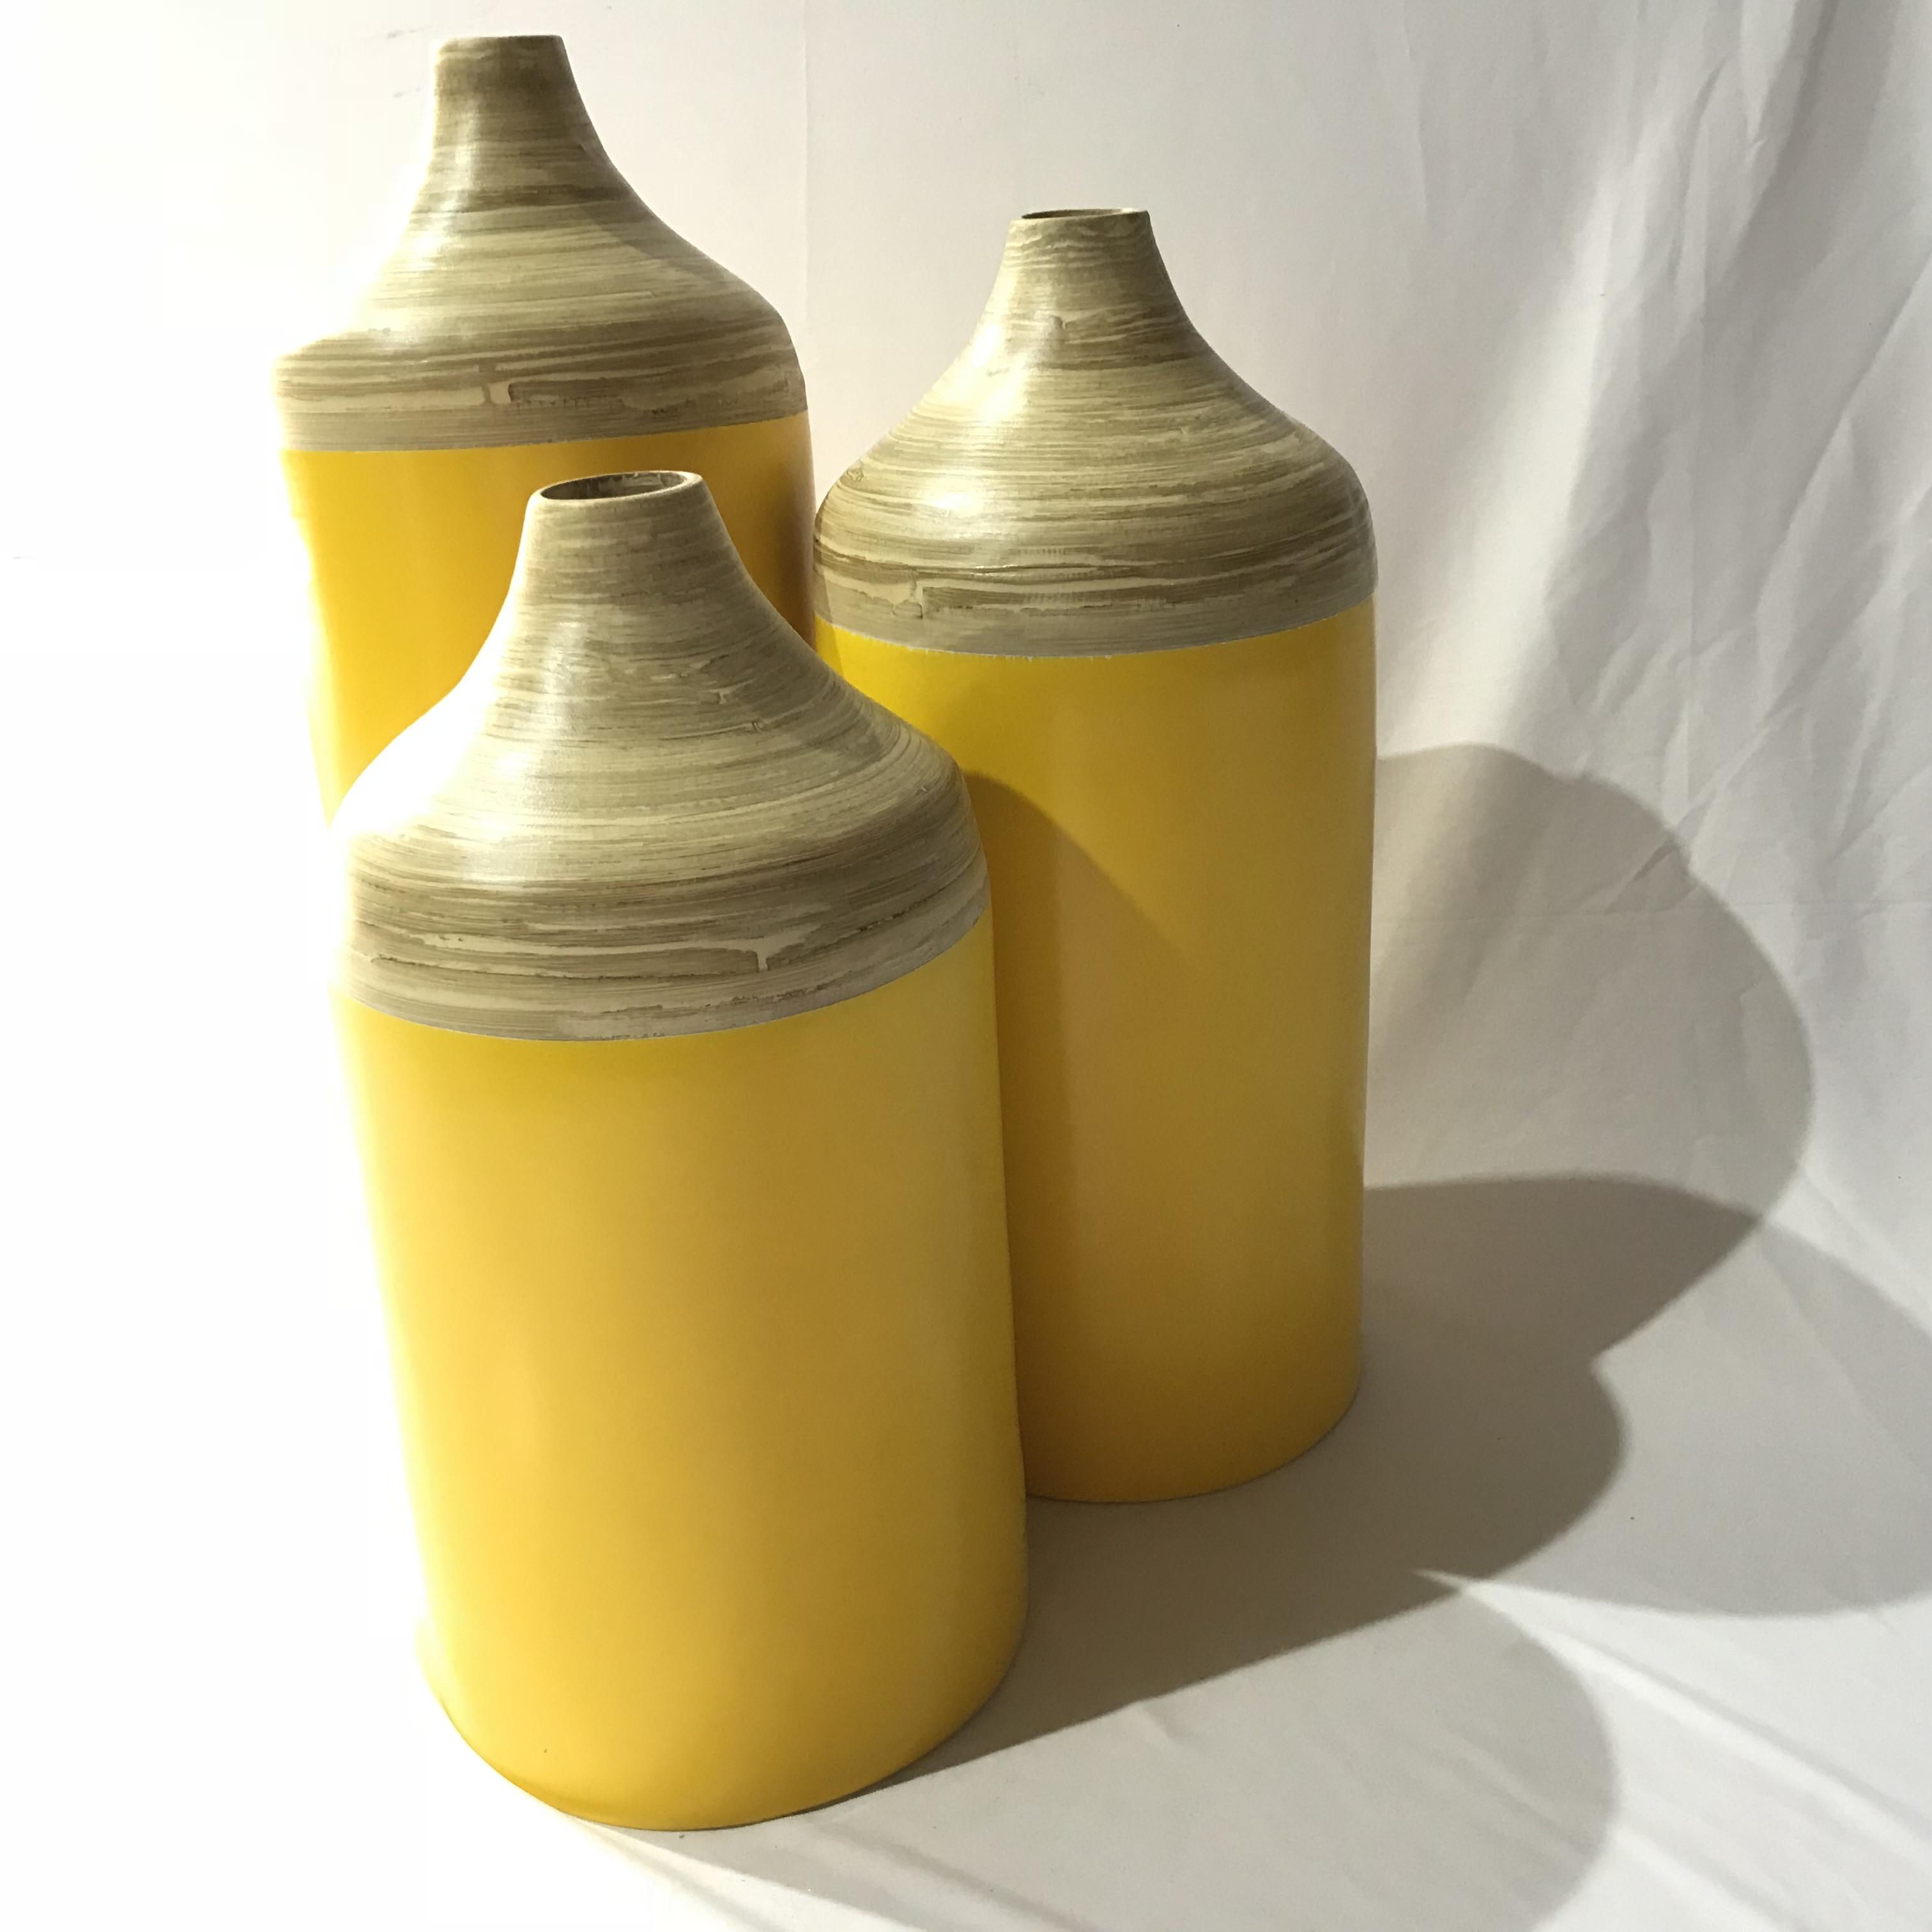 Best selling high quality bamboo decor vase handmade from Viet Nam